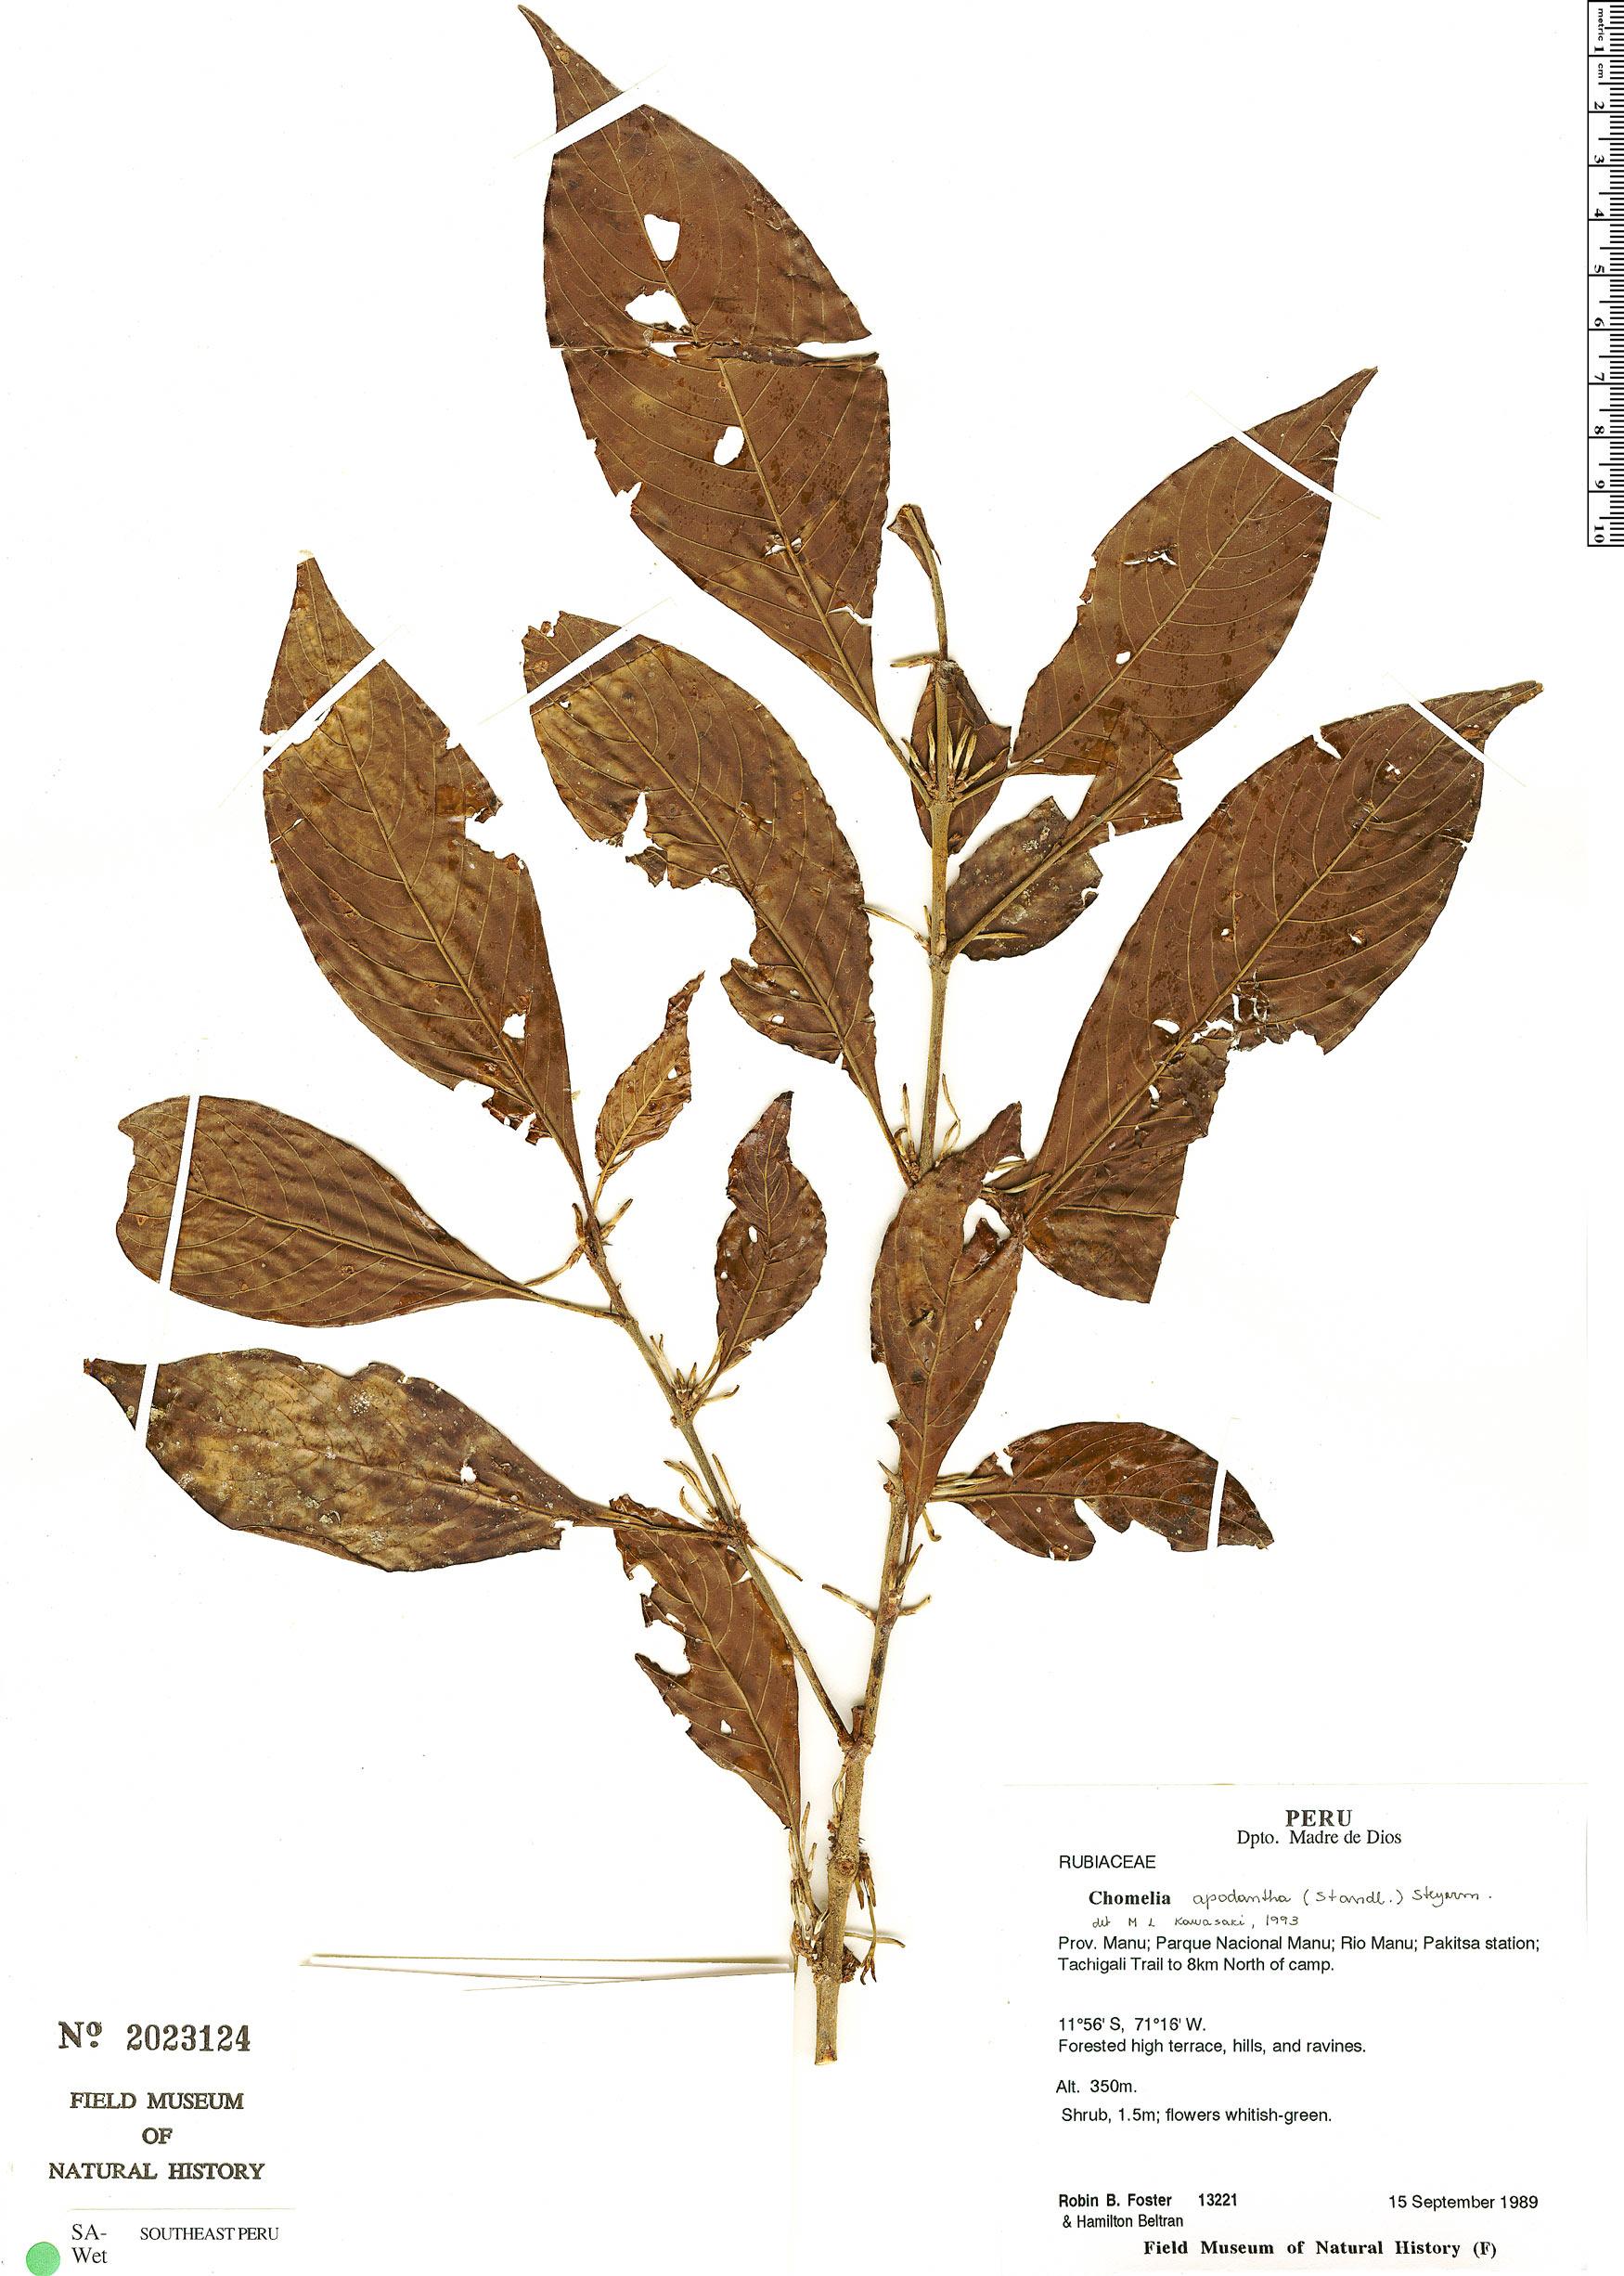 Espécime: Chomelia apodantha